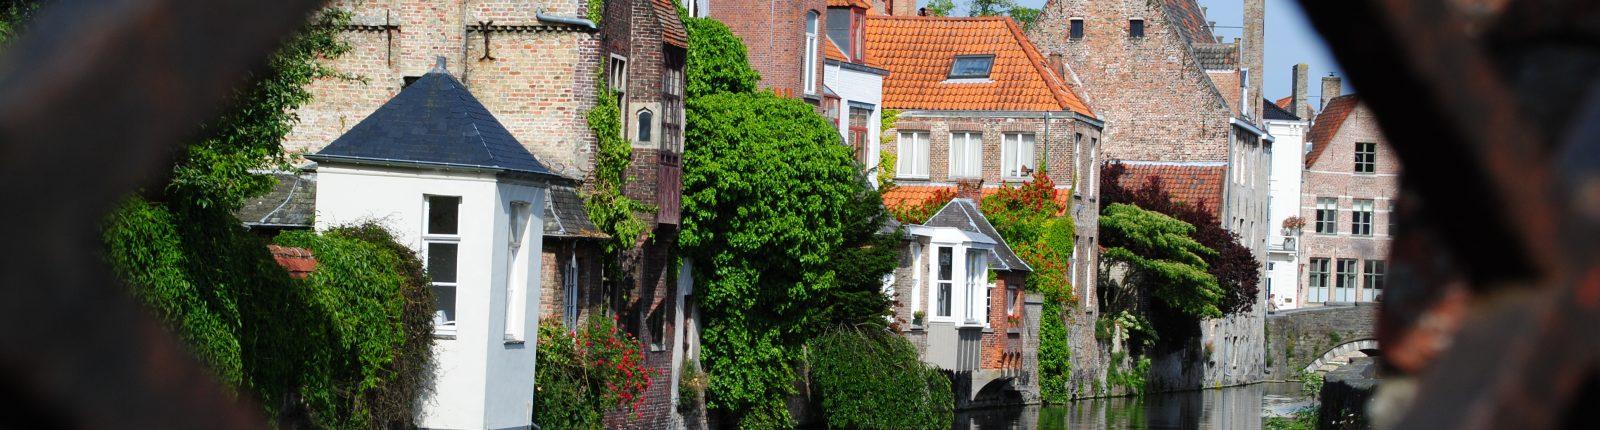 Bruxelles-Bruges